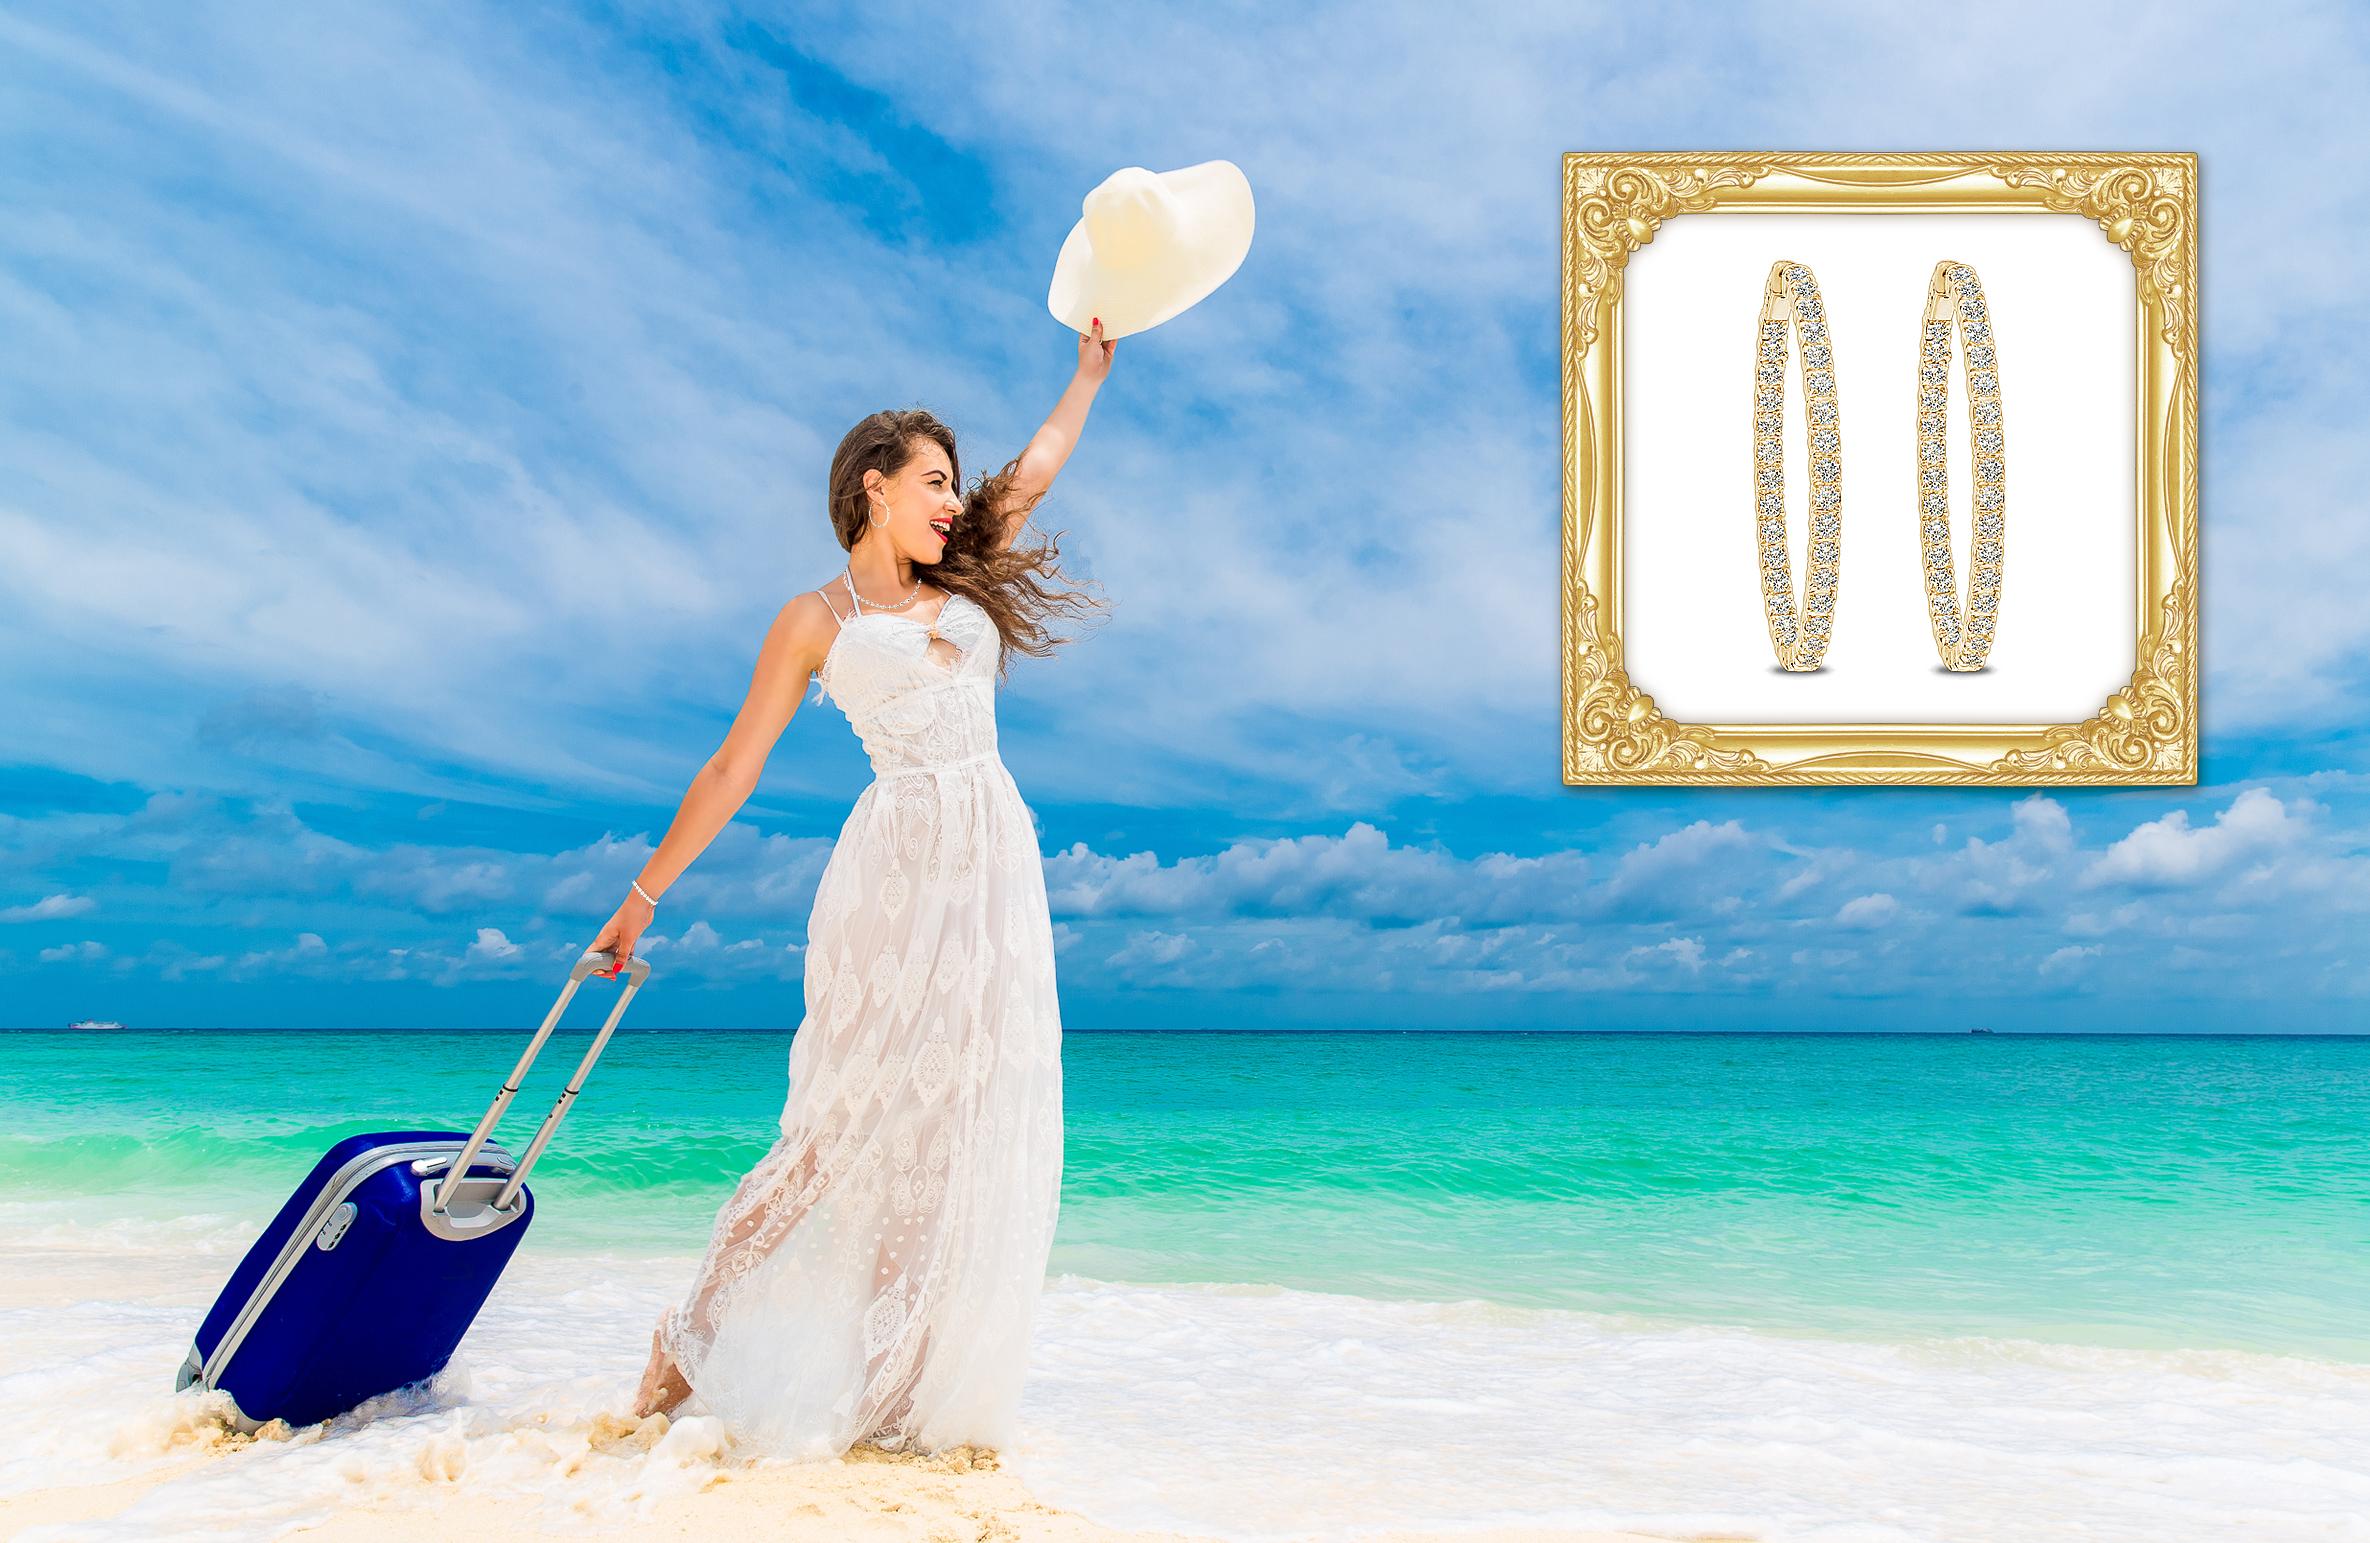 Mystique of Palm Beach | Diamond Quality Cubic Zirconia Jewelry